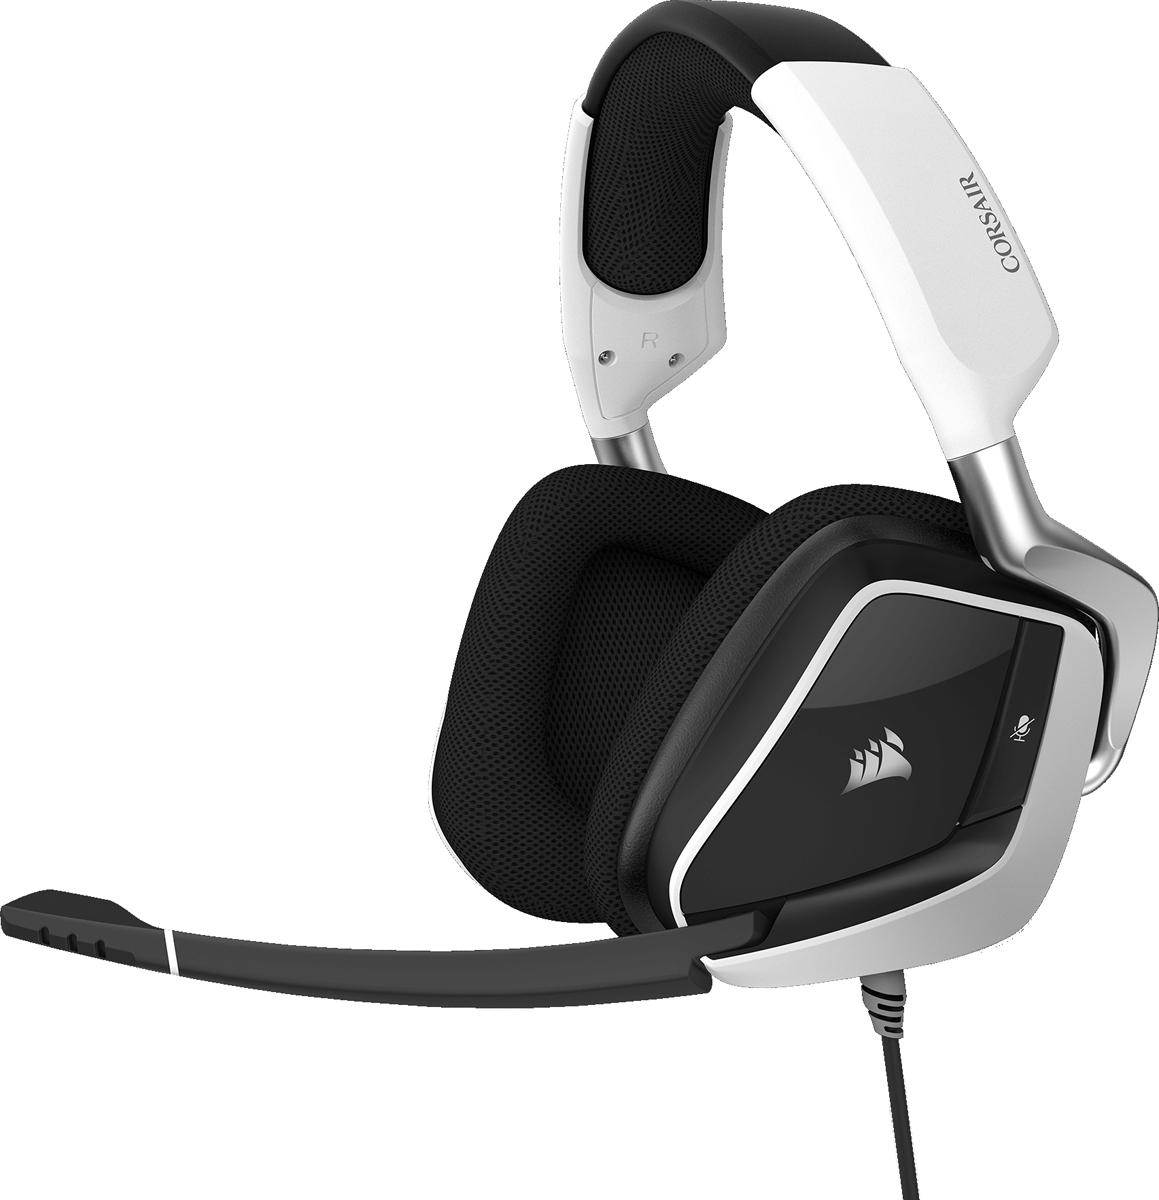 Corsair Gaming Void Pro RGB USB, White игровая гарнитура - Наушники